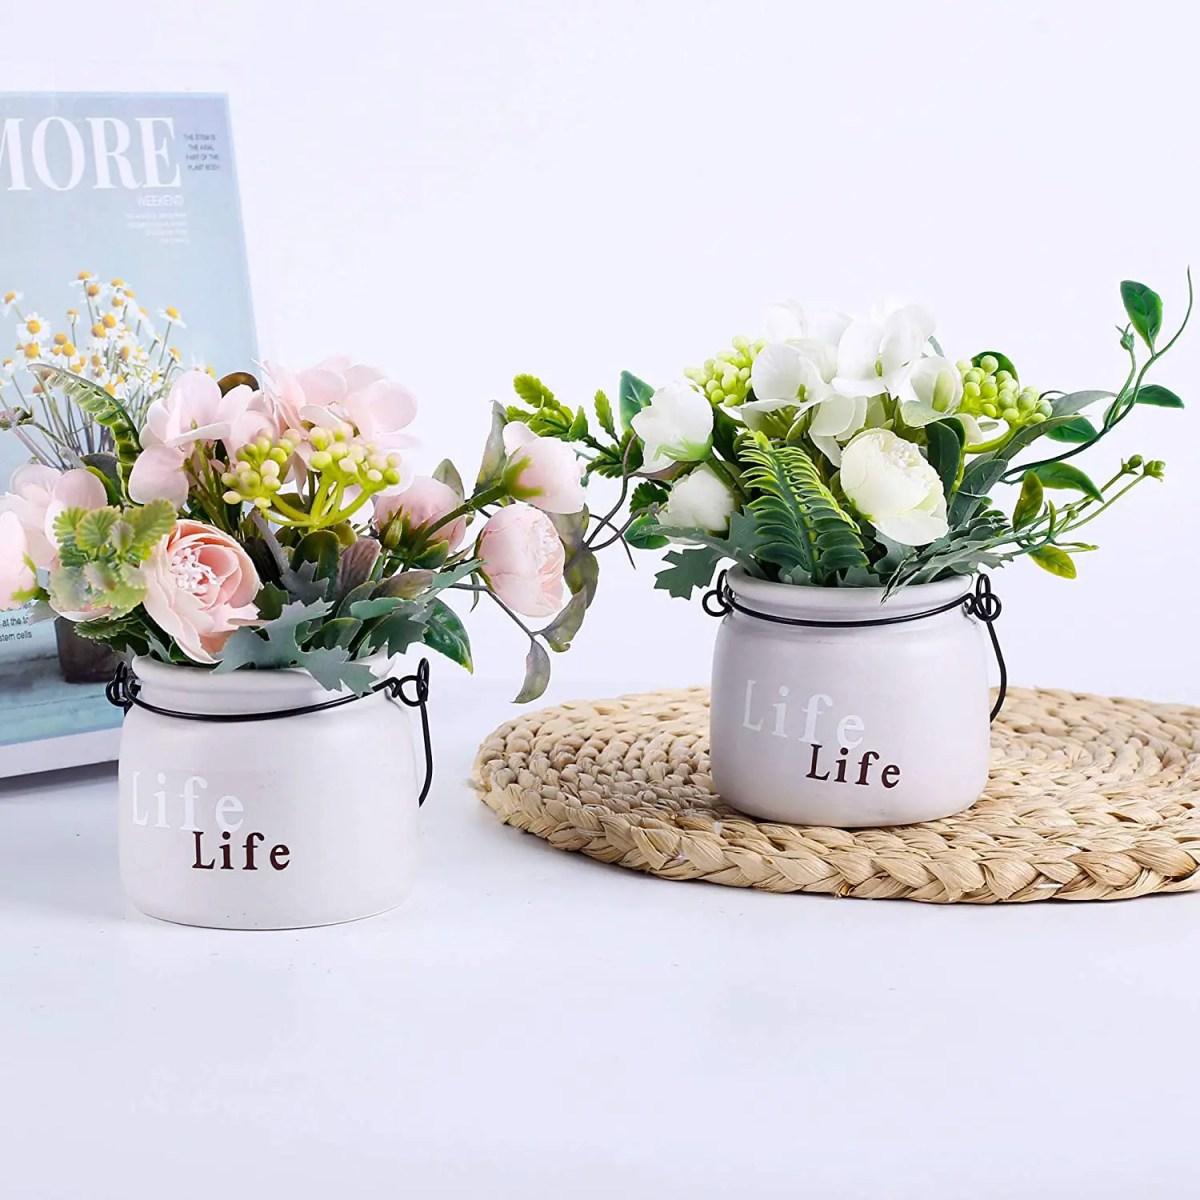 Ceramic-Vase-Modern-Farmhouse-Style